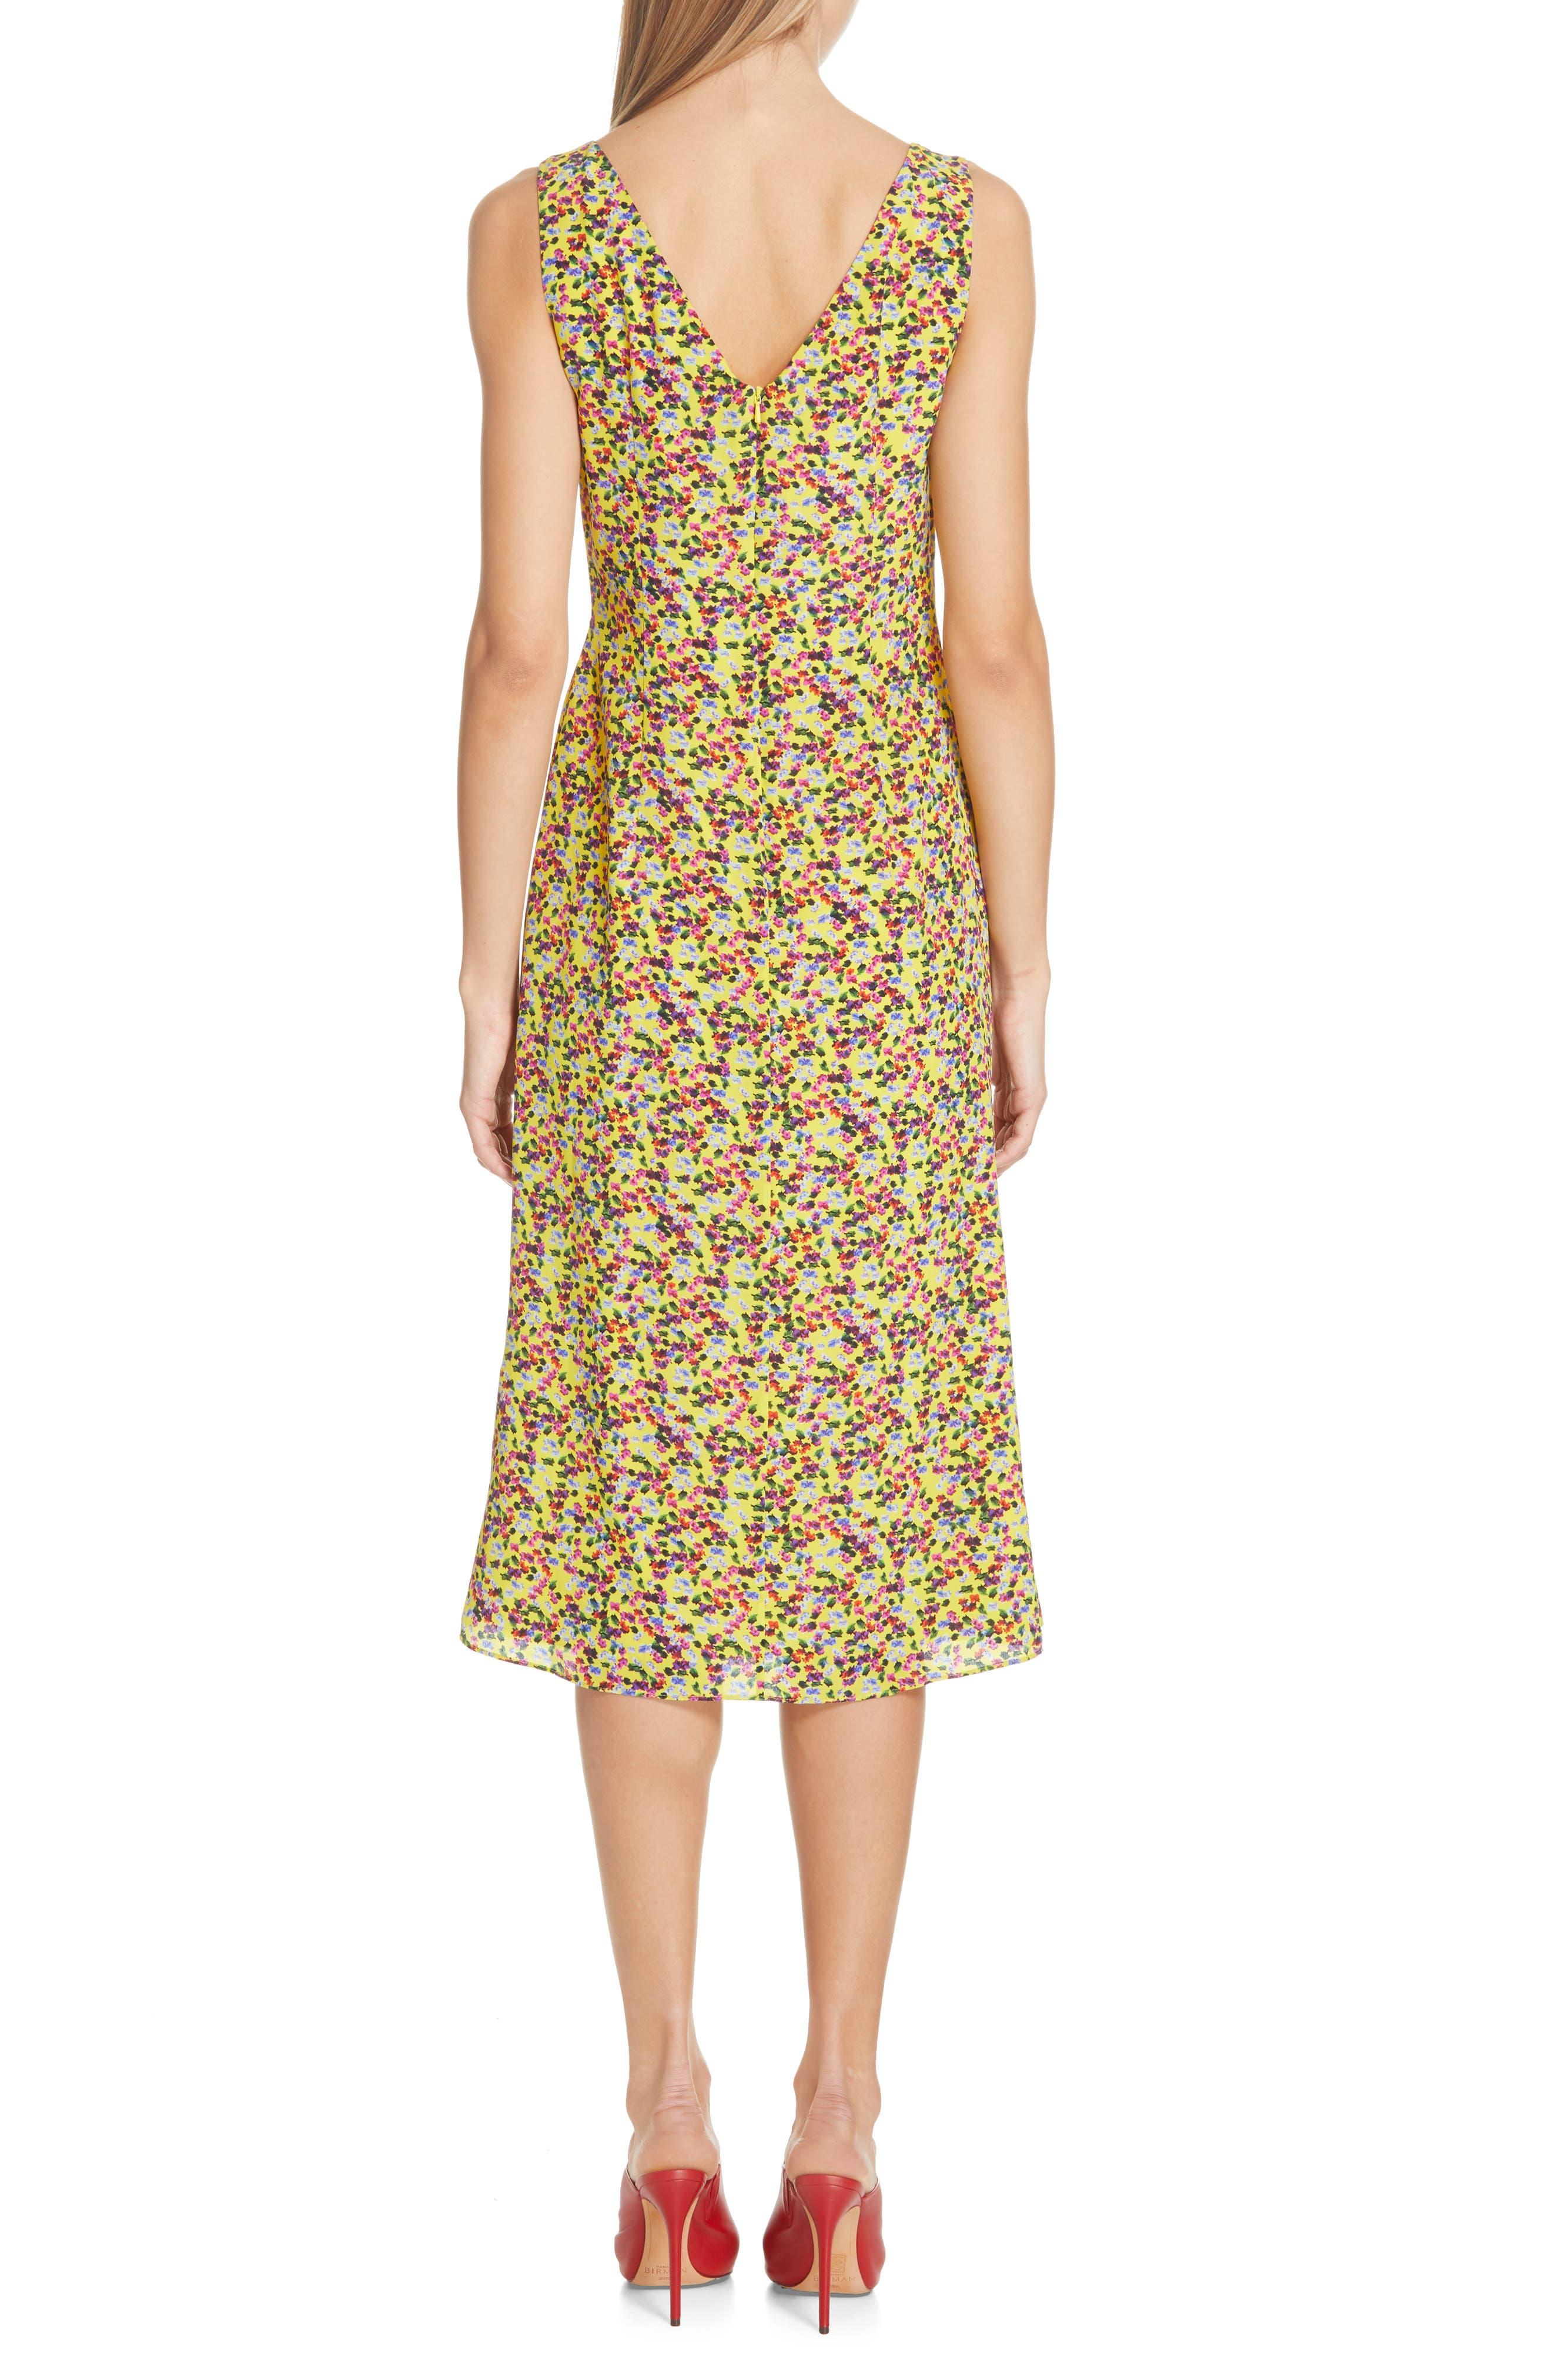 SALONI, Penelope Floral Print Silk Midi Dress, Alternate thumbnail 2, color, YELLOW GARDENIA